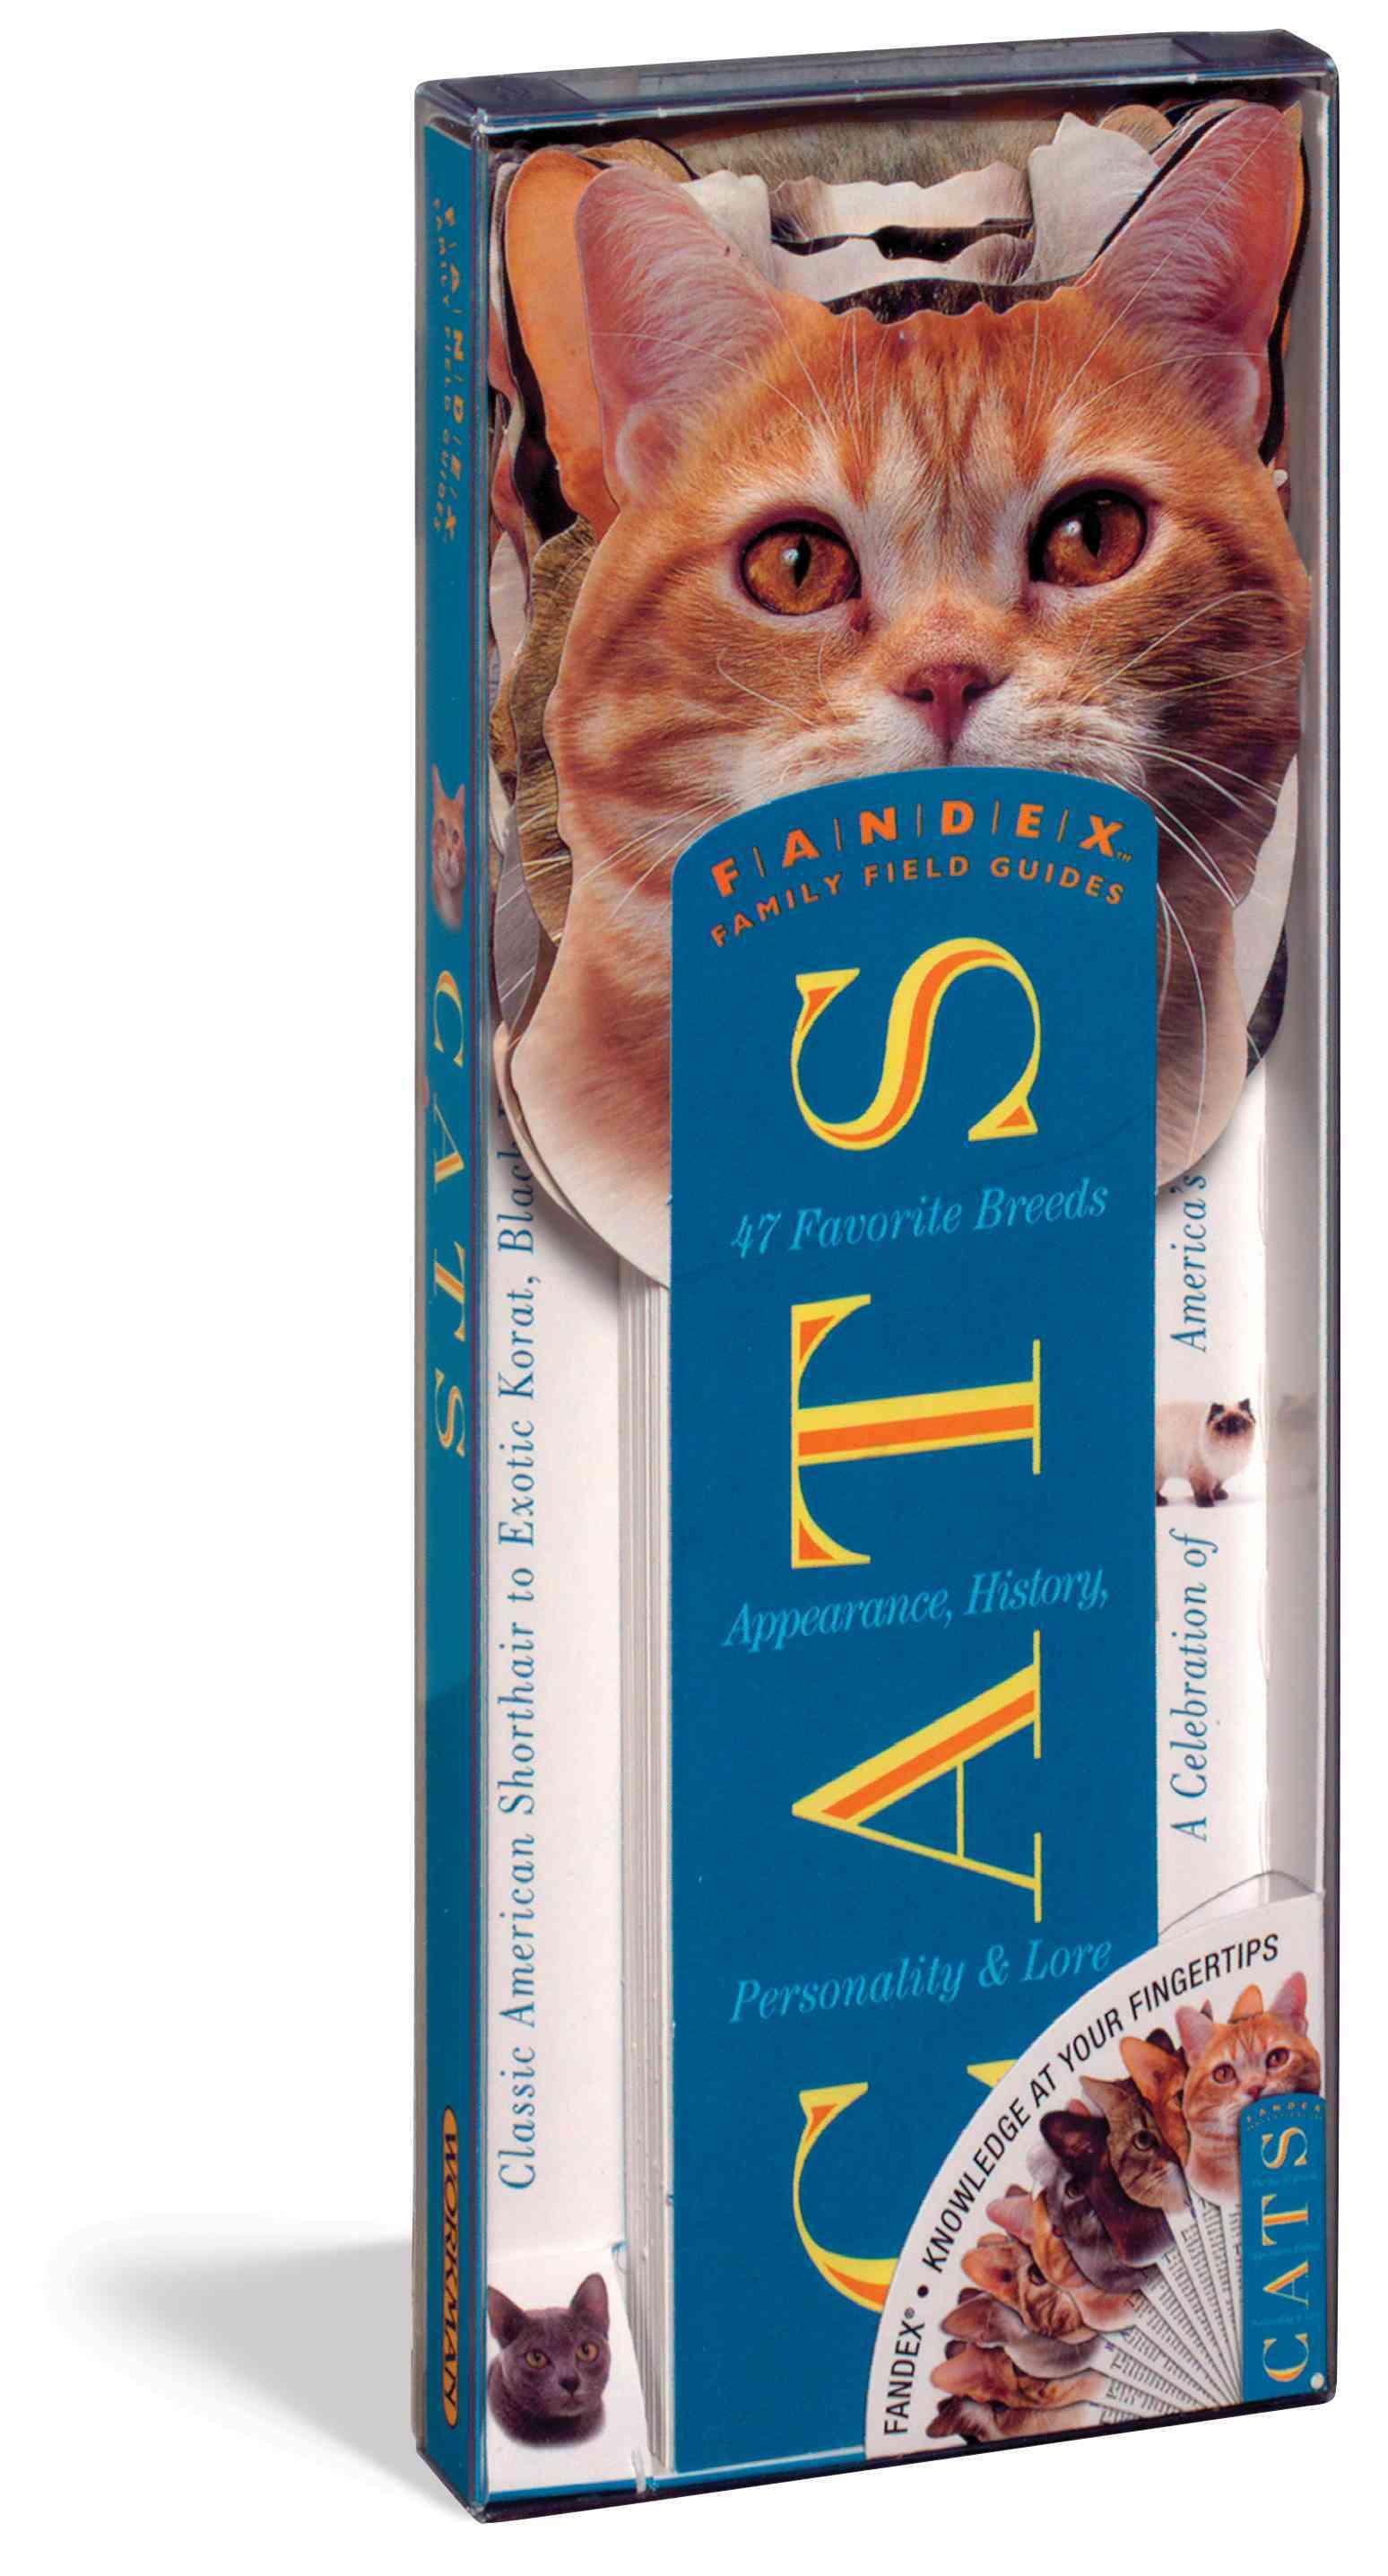 Cats By Petras, Kathryn/ Yamazaki, Tetsu/ Petras, Ross